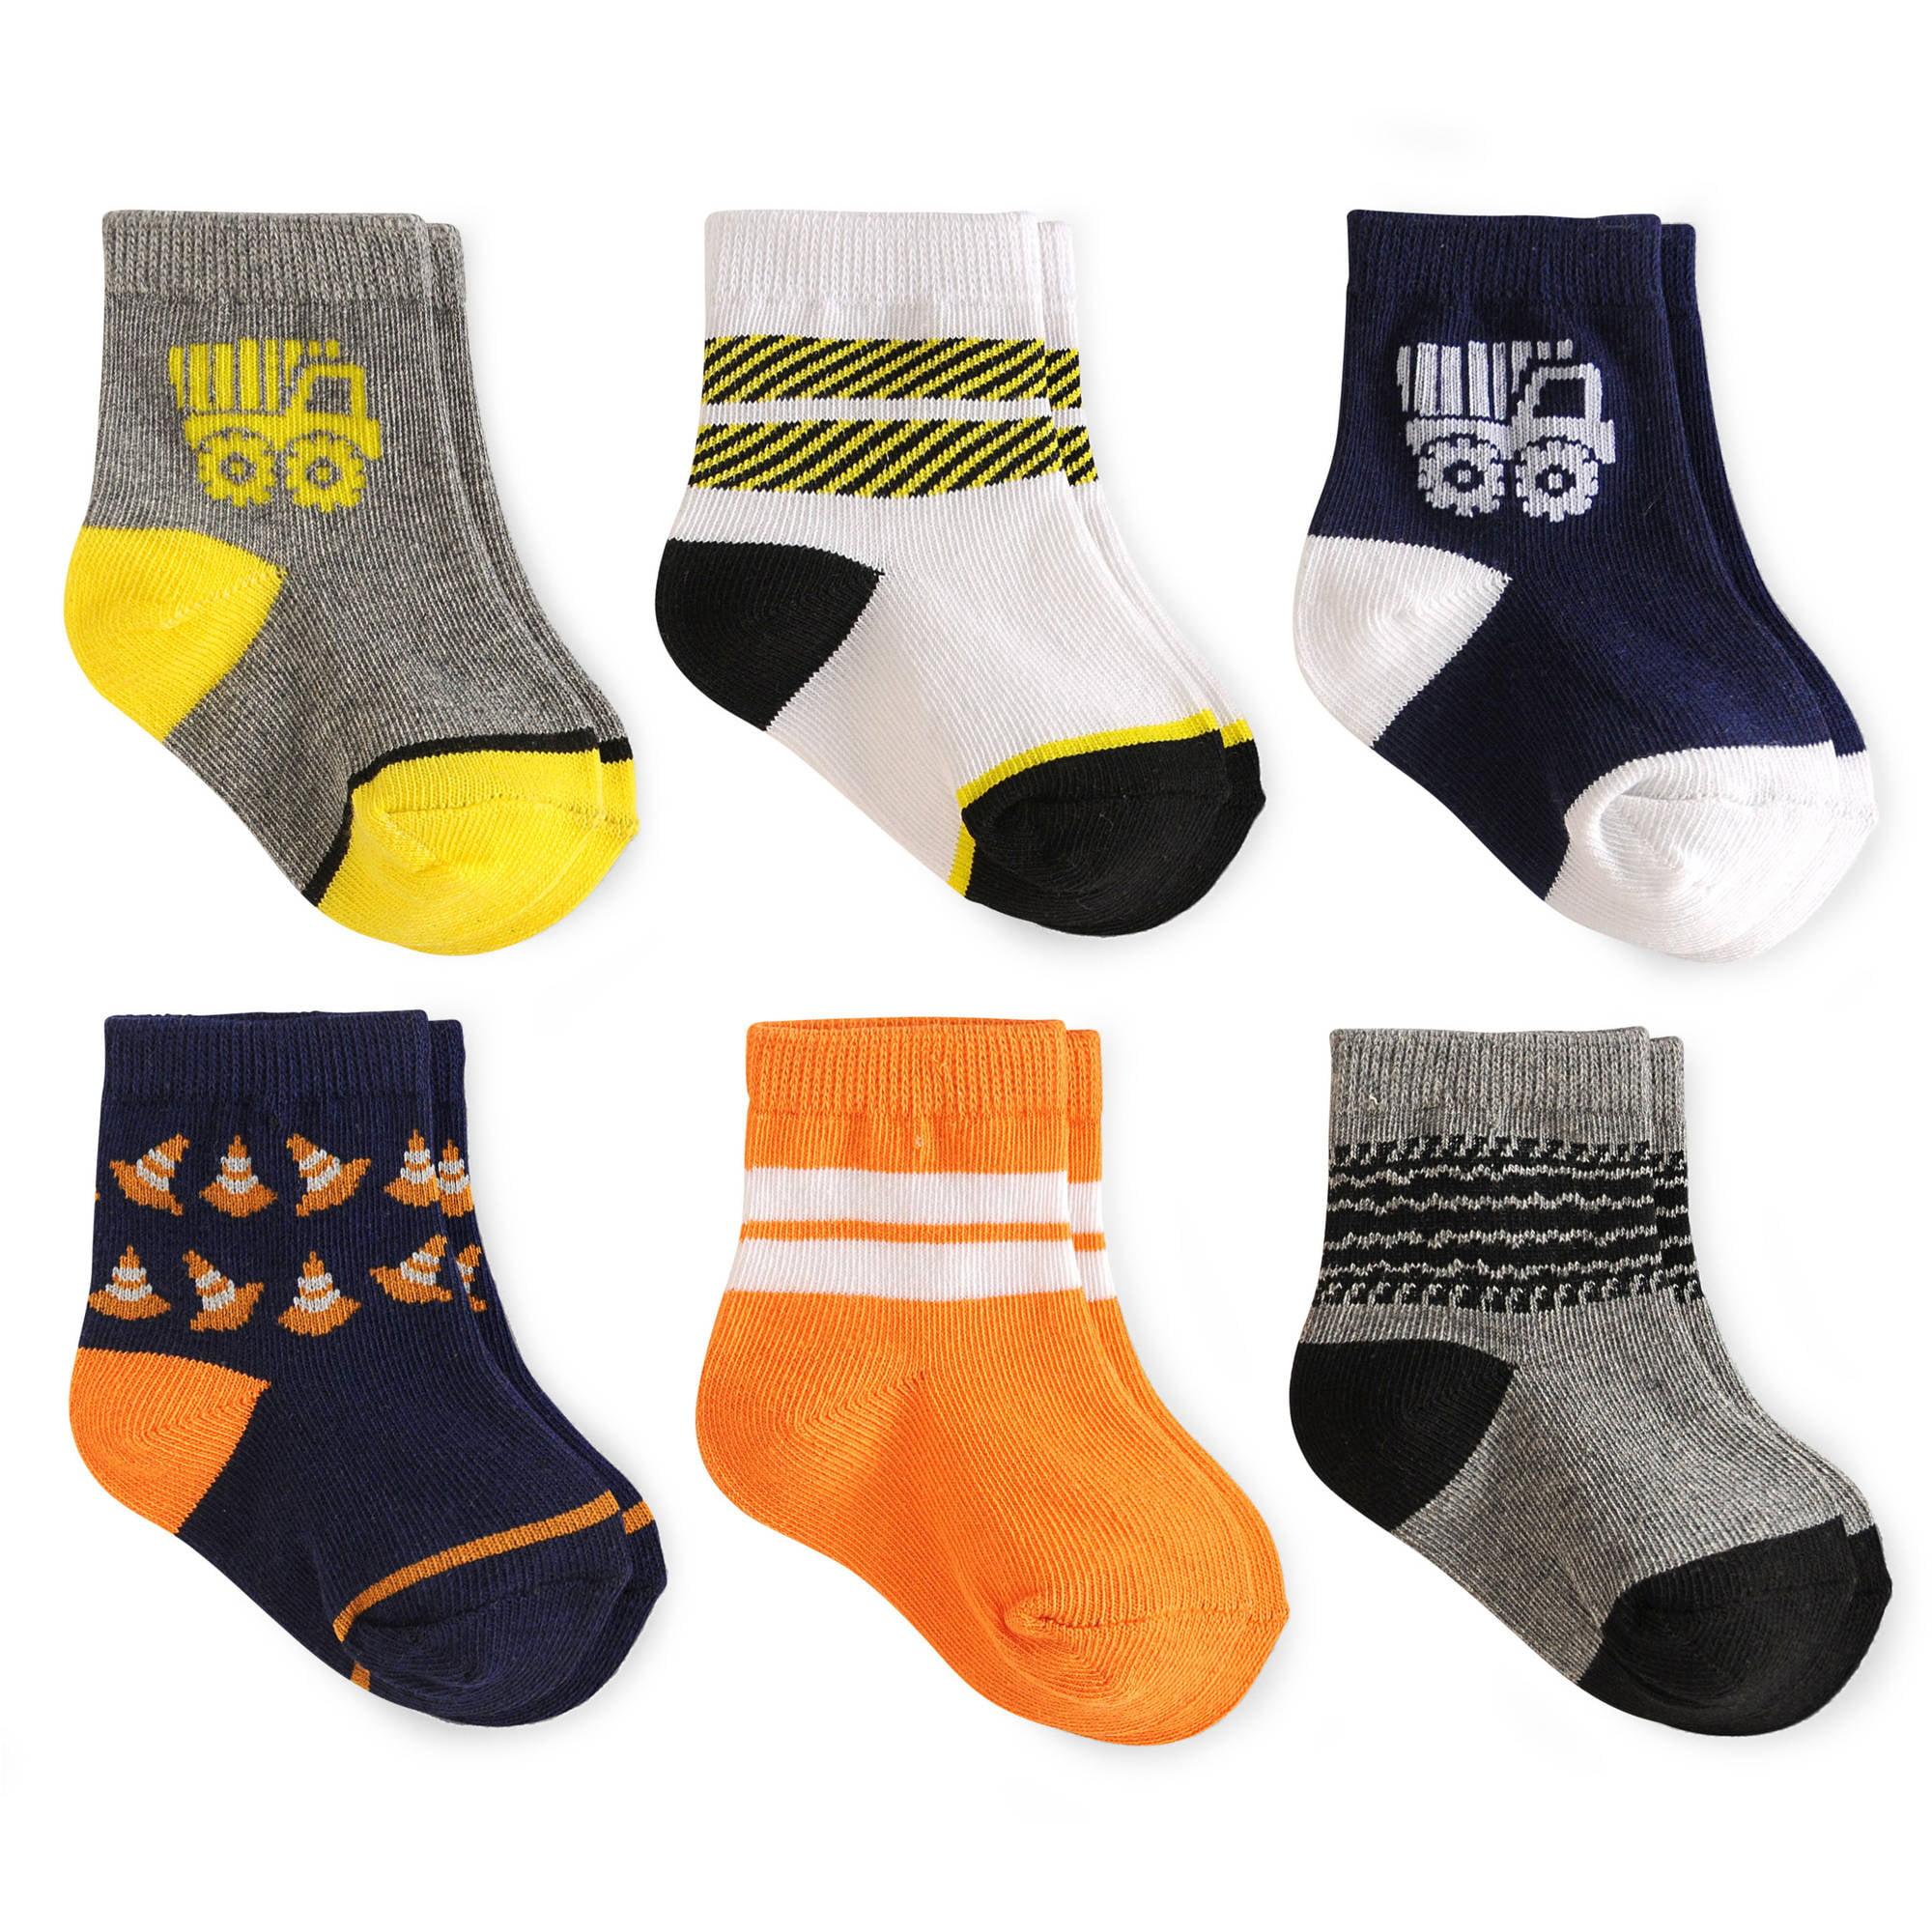 Garanimals Newborn Baby Boy Socks Ages, 6-Pack